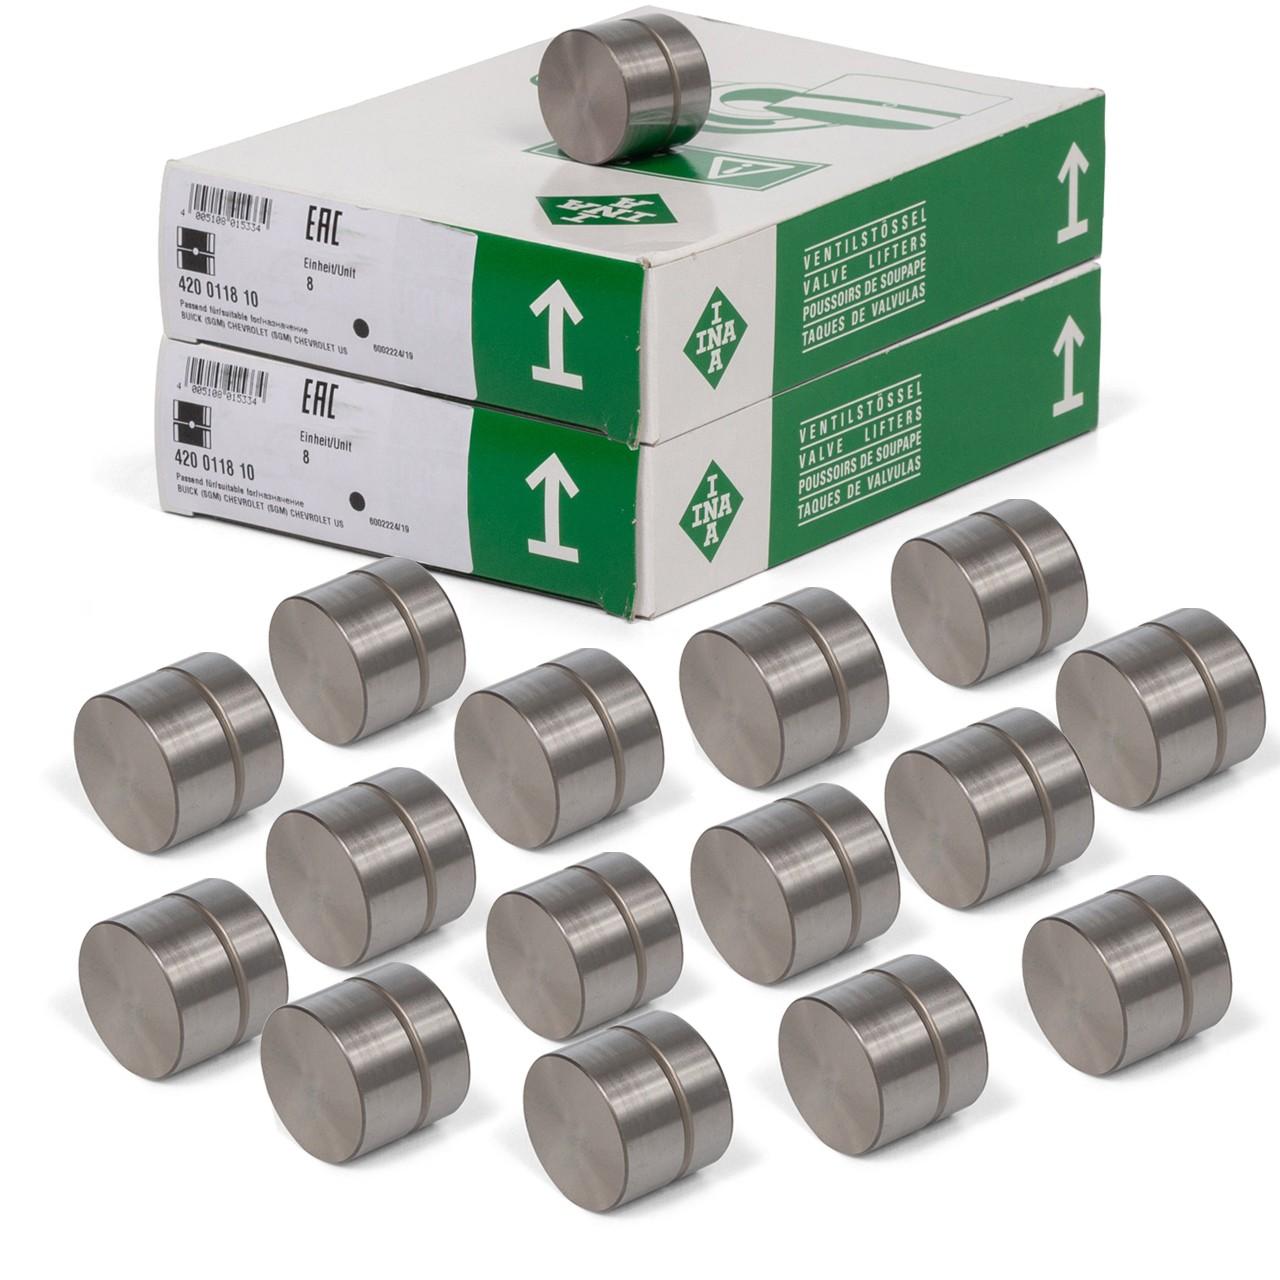 16x INA 420011810 Ventilstössel für OPEL ASTRA CORSA OMEGA SIGNUM VECTRA ZAFIRA